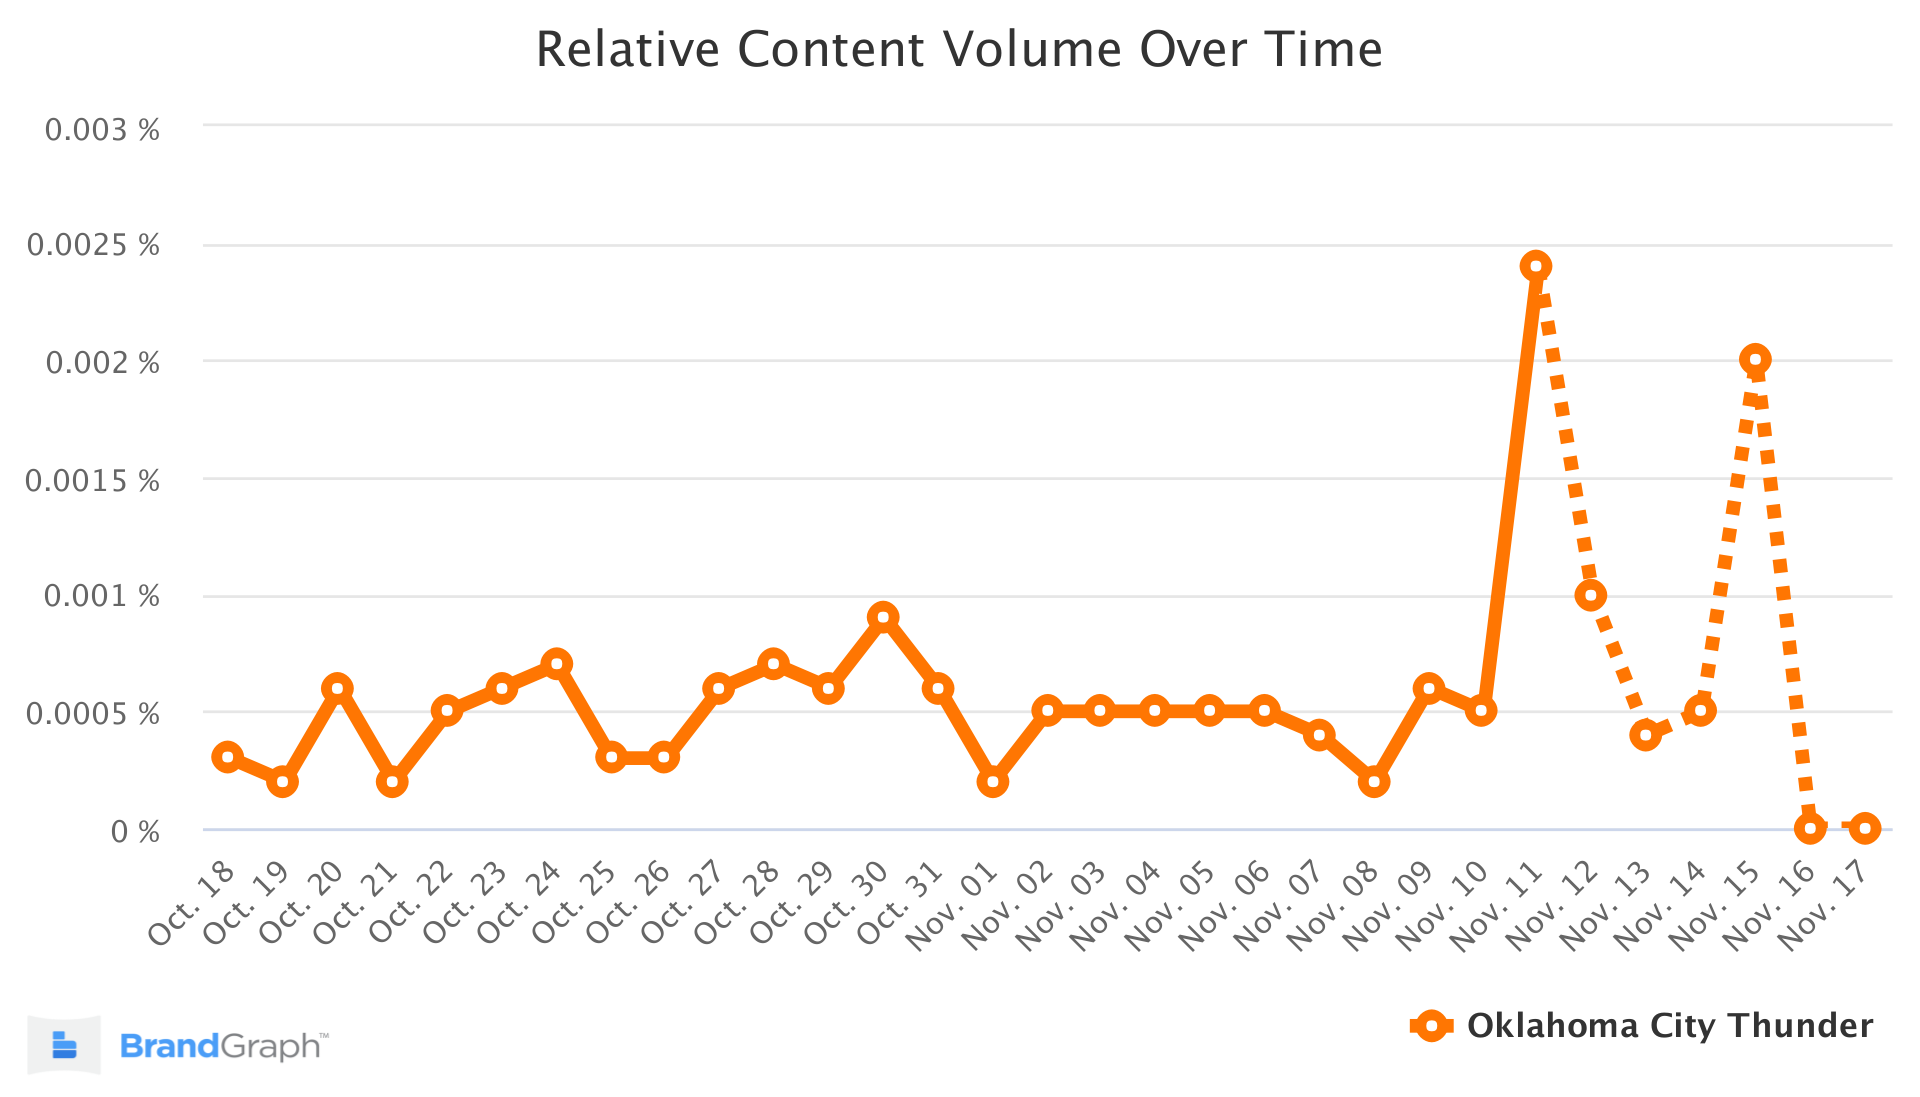 OKC BrandGraph Trend